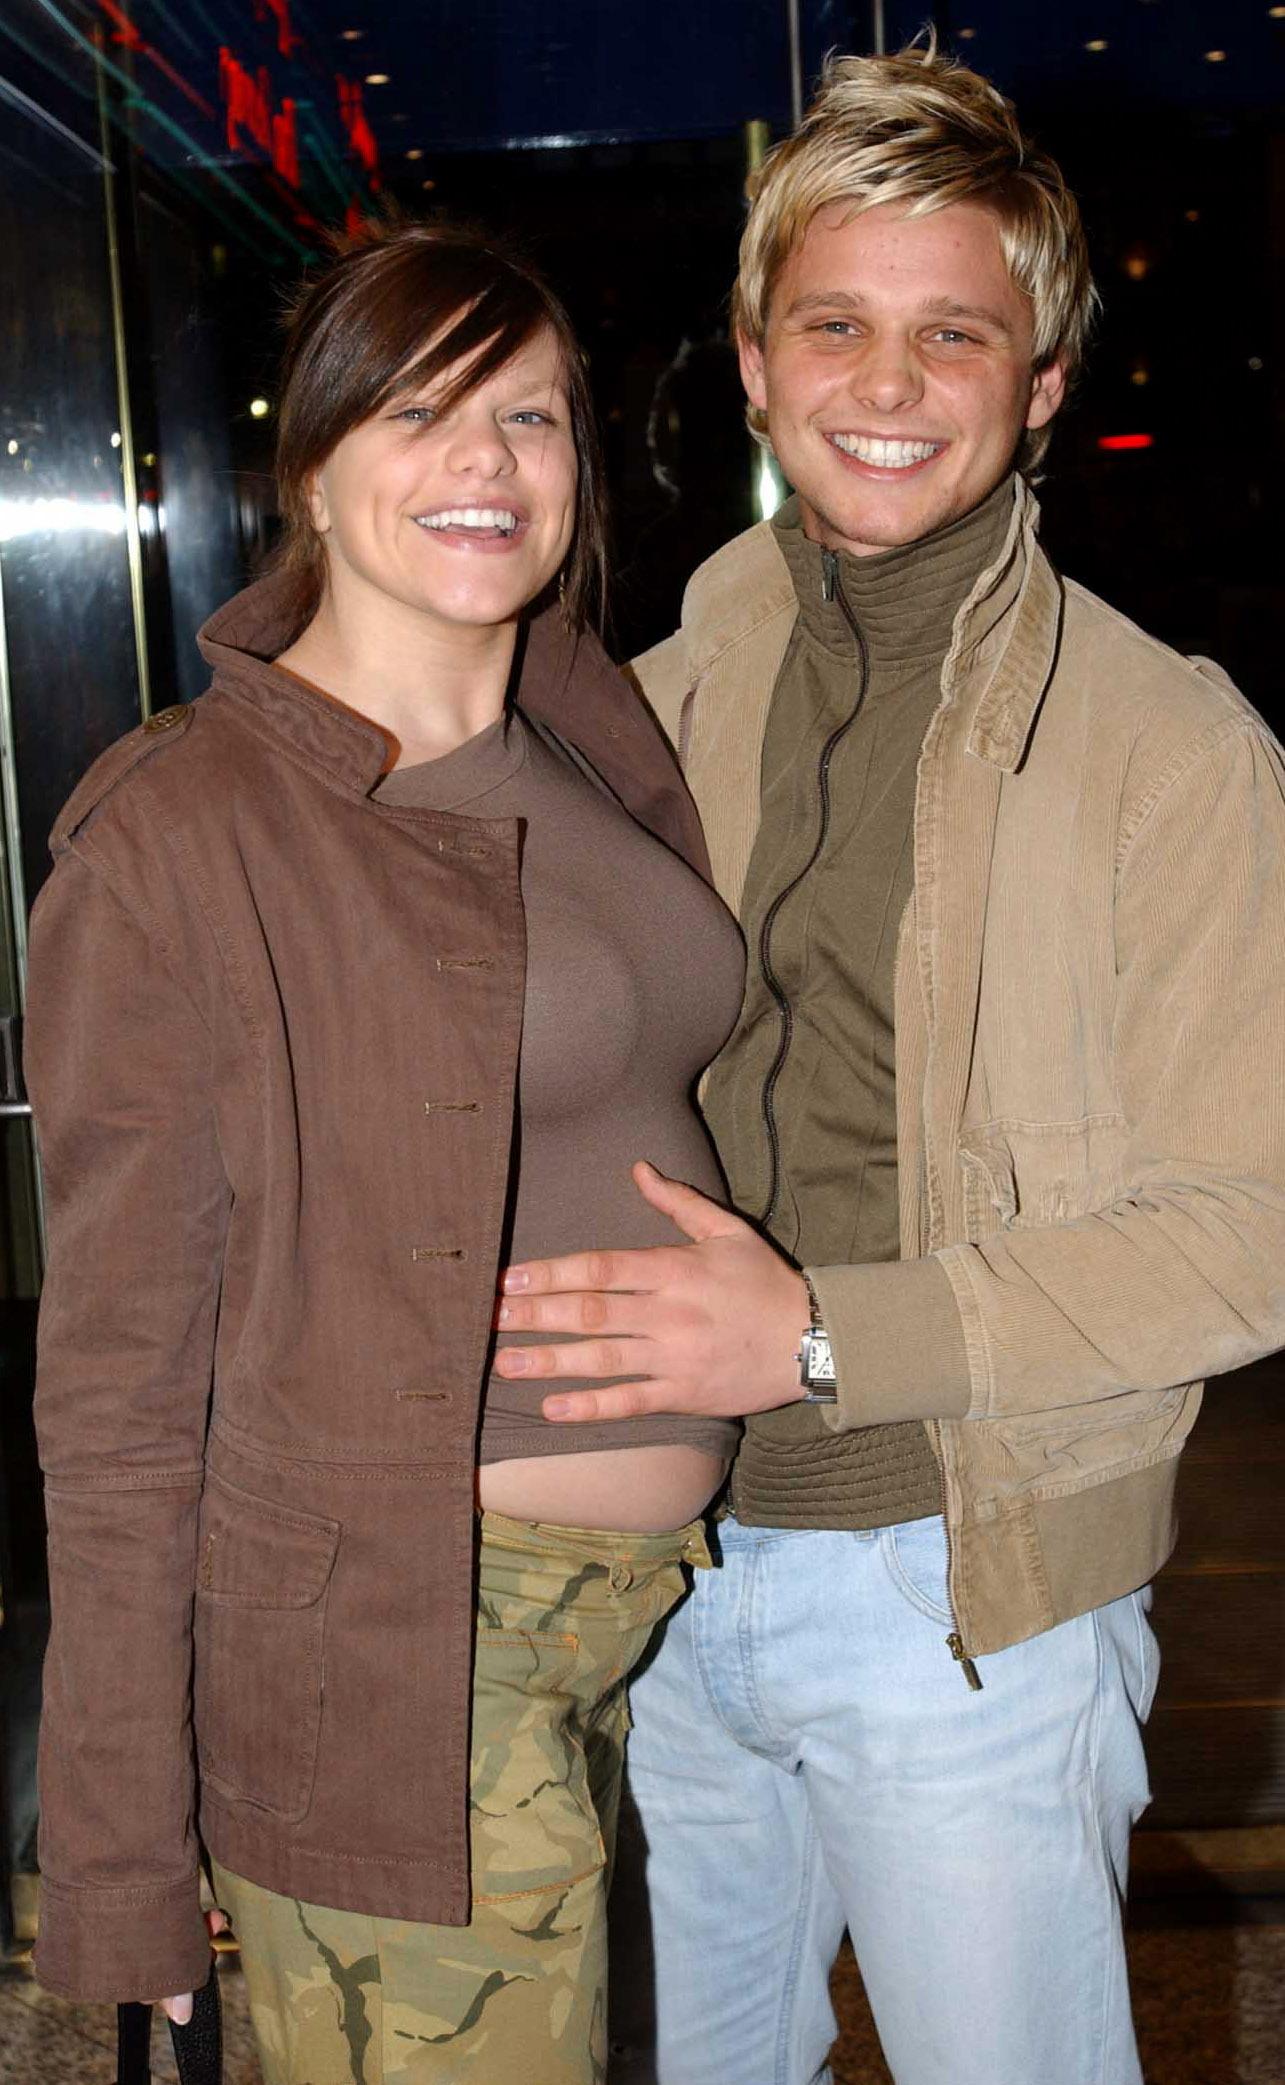 Jade Goody Jeff Brazier at premiere in 2003.